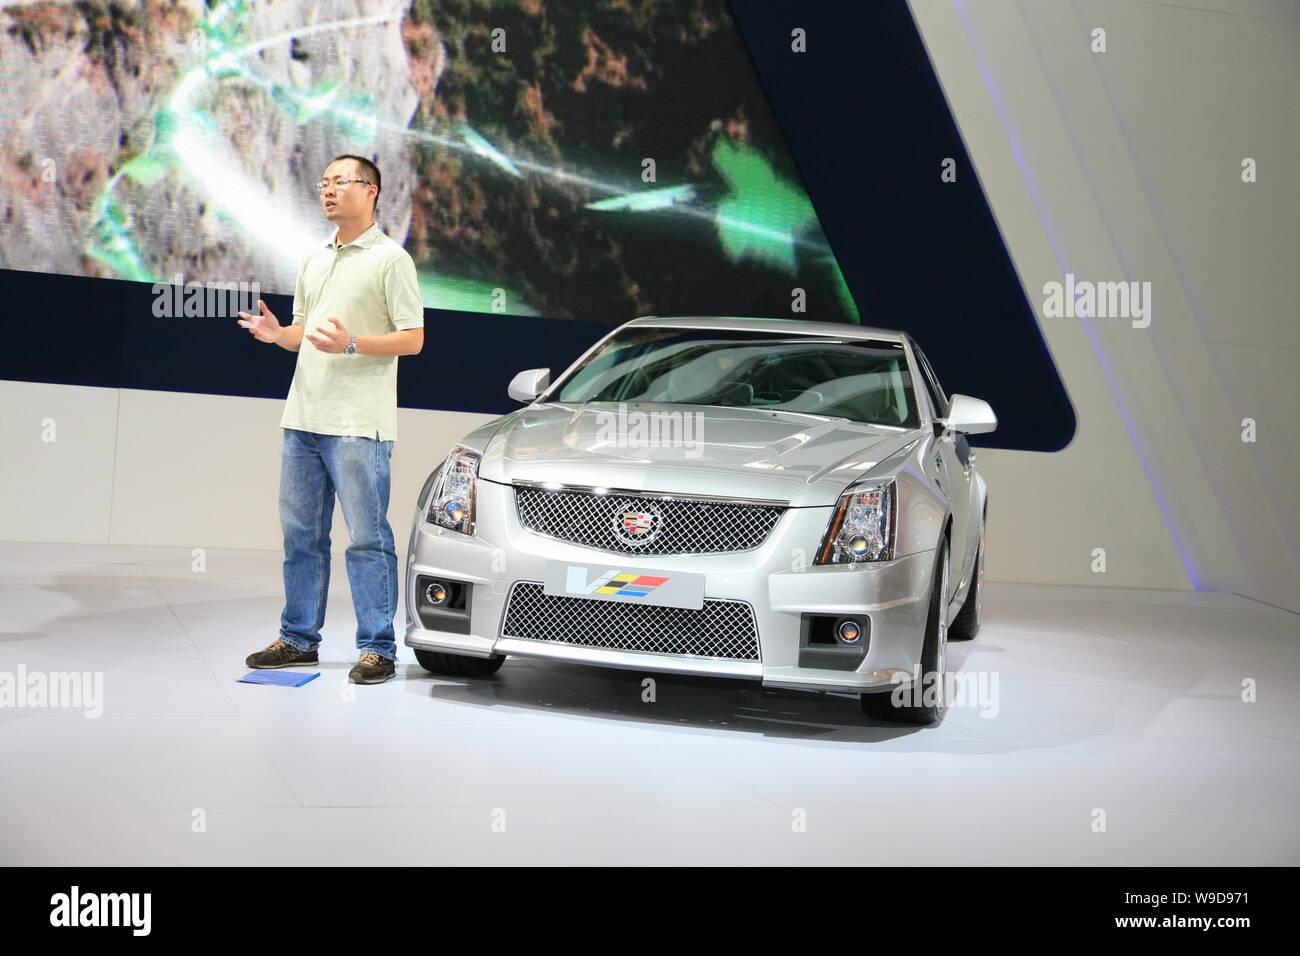 Cadillac Cts V Stock Photos & Cadillac Cts V Stock Images